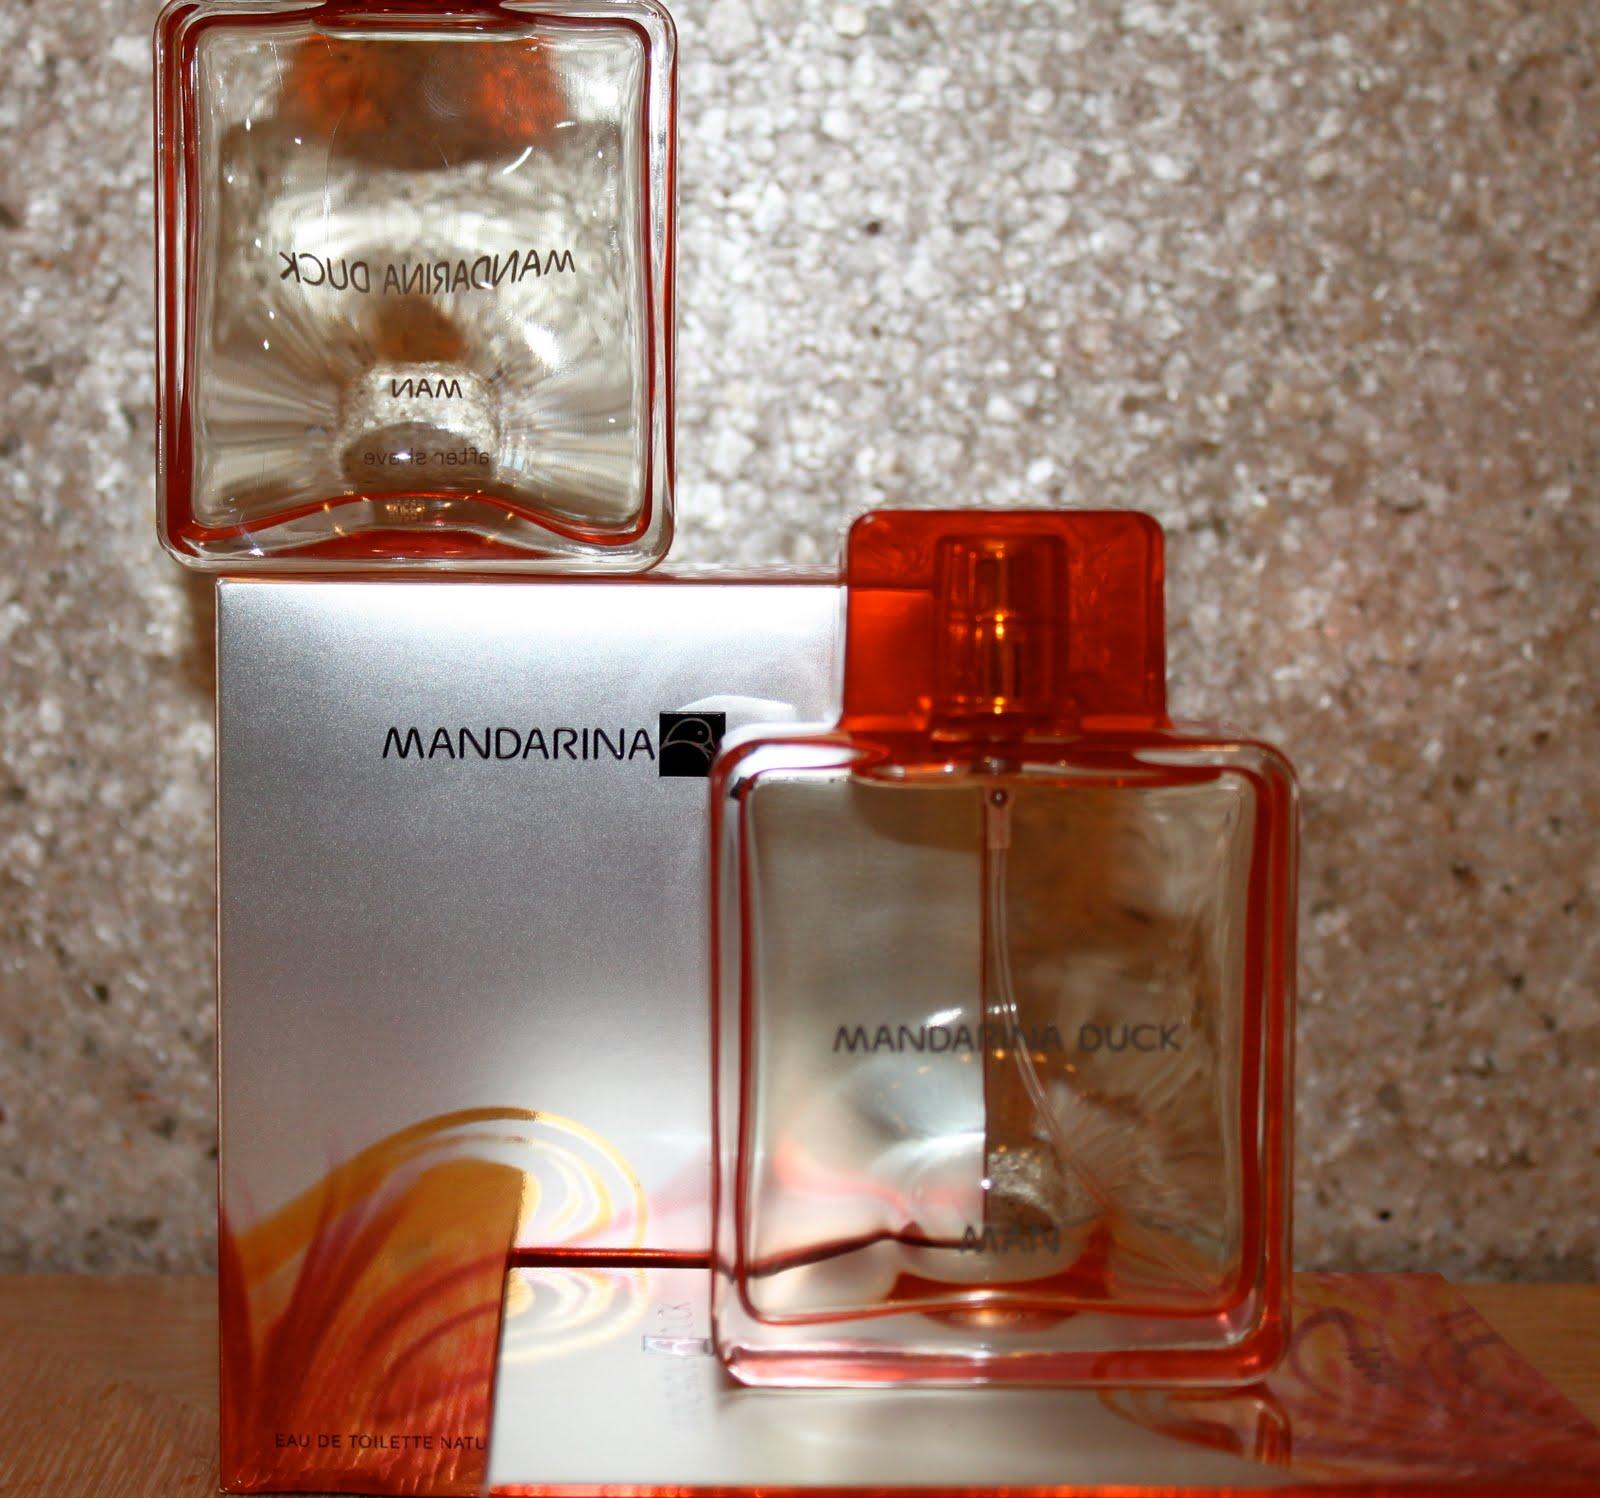 Mandarina Duck Pure Black Eau De Toilette Bos  Charlie White 100ml Lyra Mag